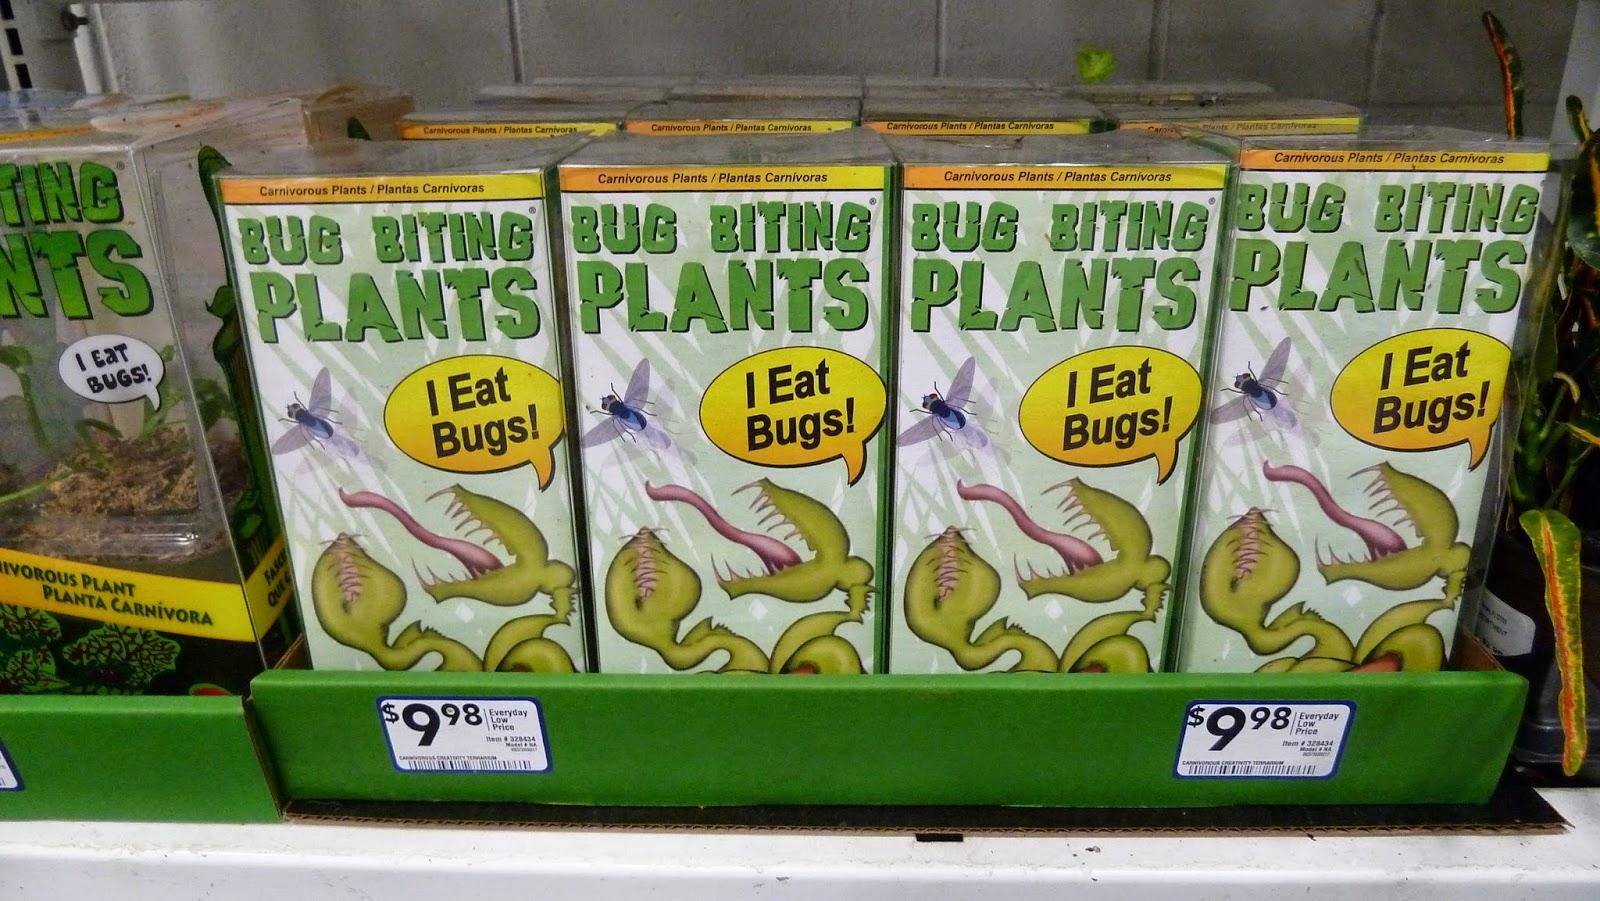 Hooray plants bug biting plants terrarium kit from lowes